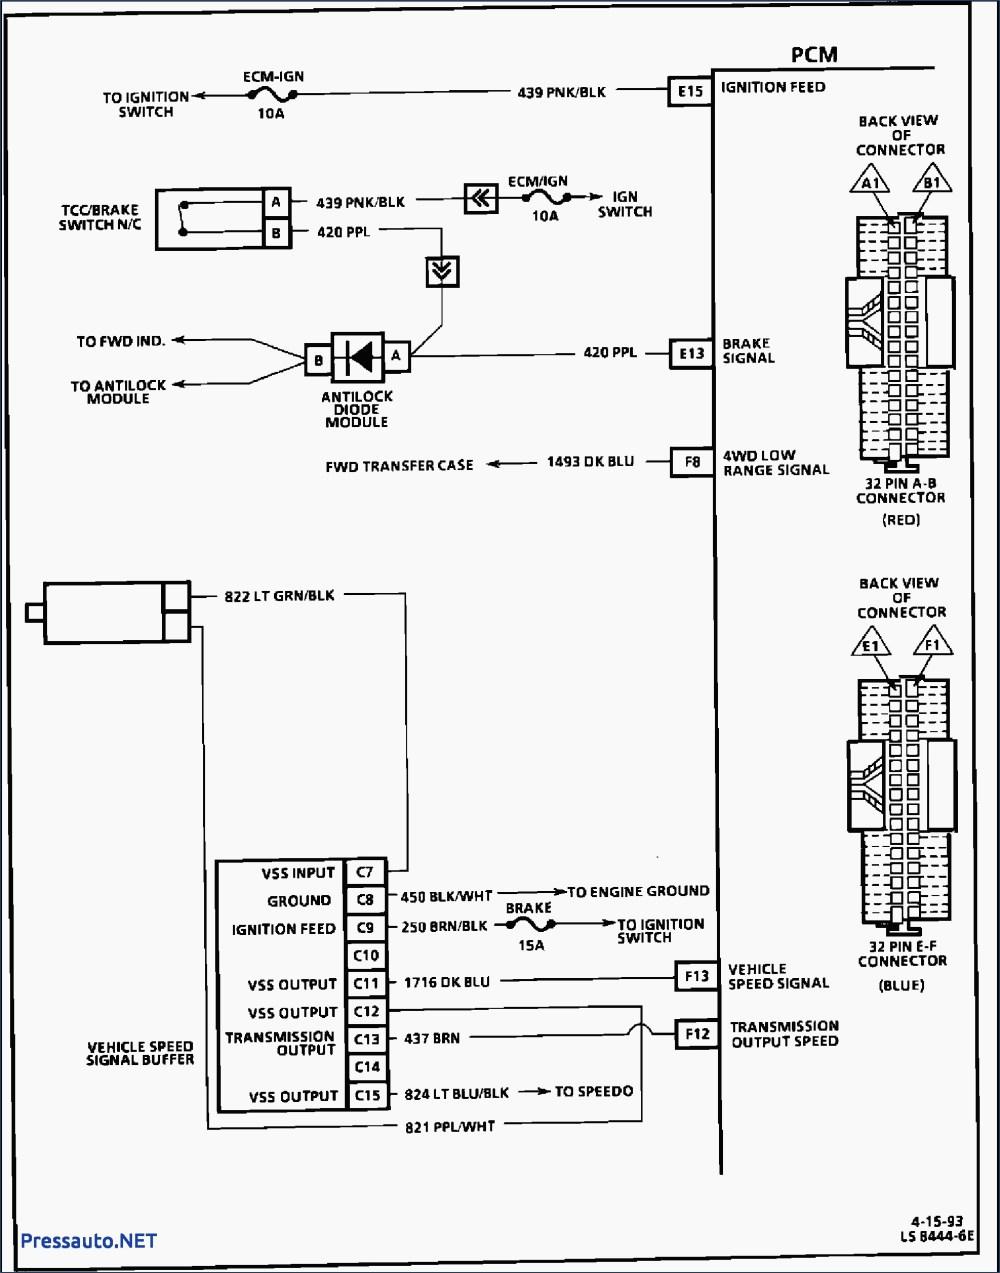 medium resolution of allison transmission wiring schematic brilliant ideas 4l60e transmission wiring diagram fresh allison at 4l60e 8e